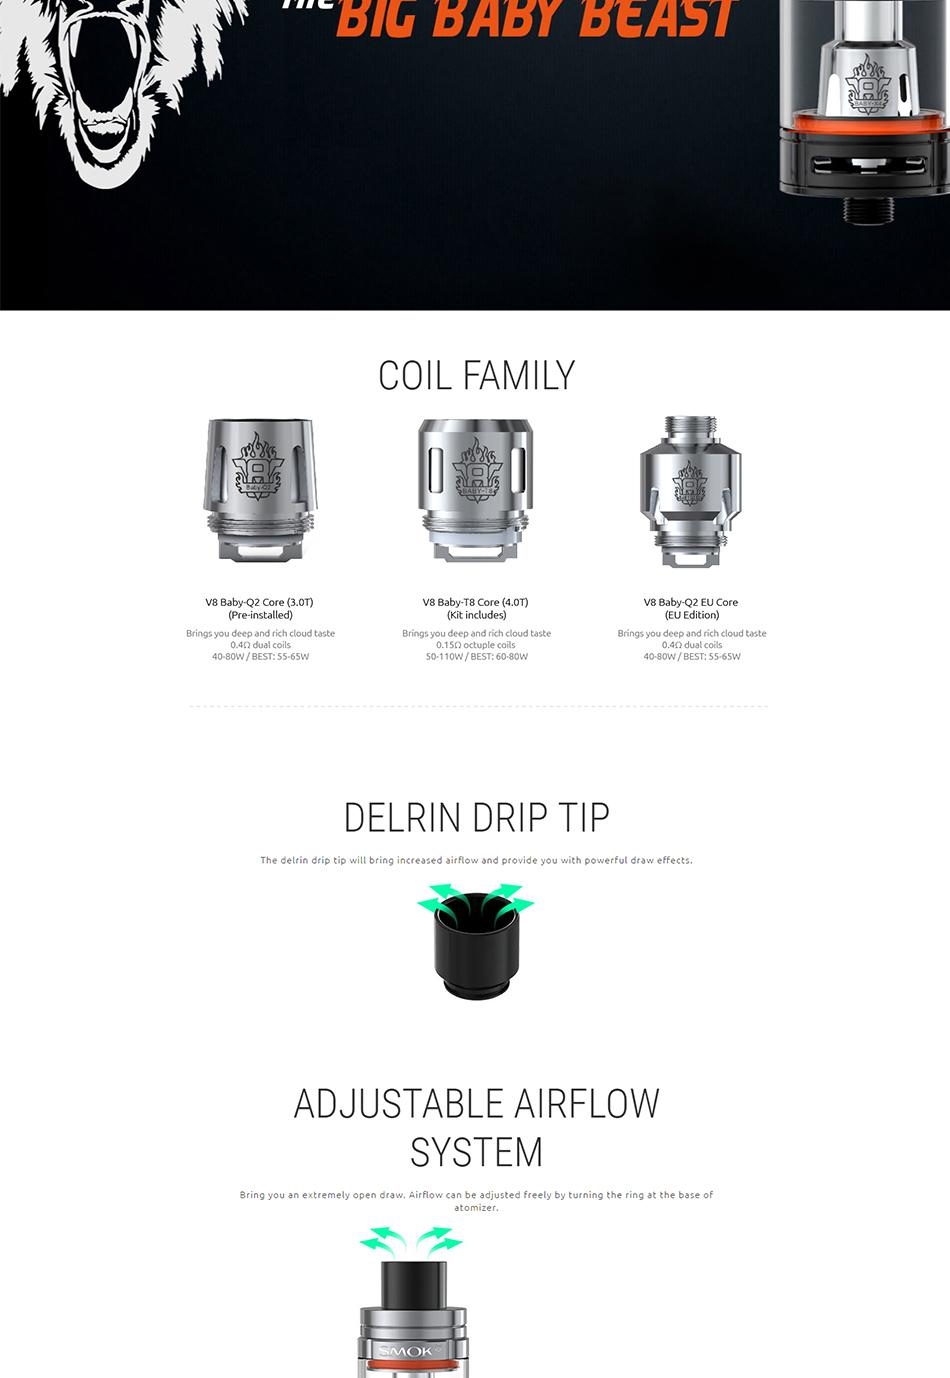 , 100% Original 220W SMOK T-Priv TC Vape Kit with 5ml TFV8 Big Baby Tank & 220W SMOK T-Priv Box Mod vs Smok alien/G-priv/GX350